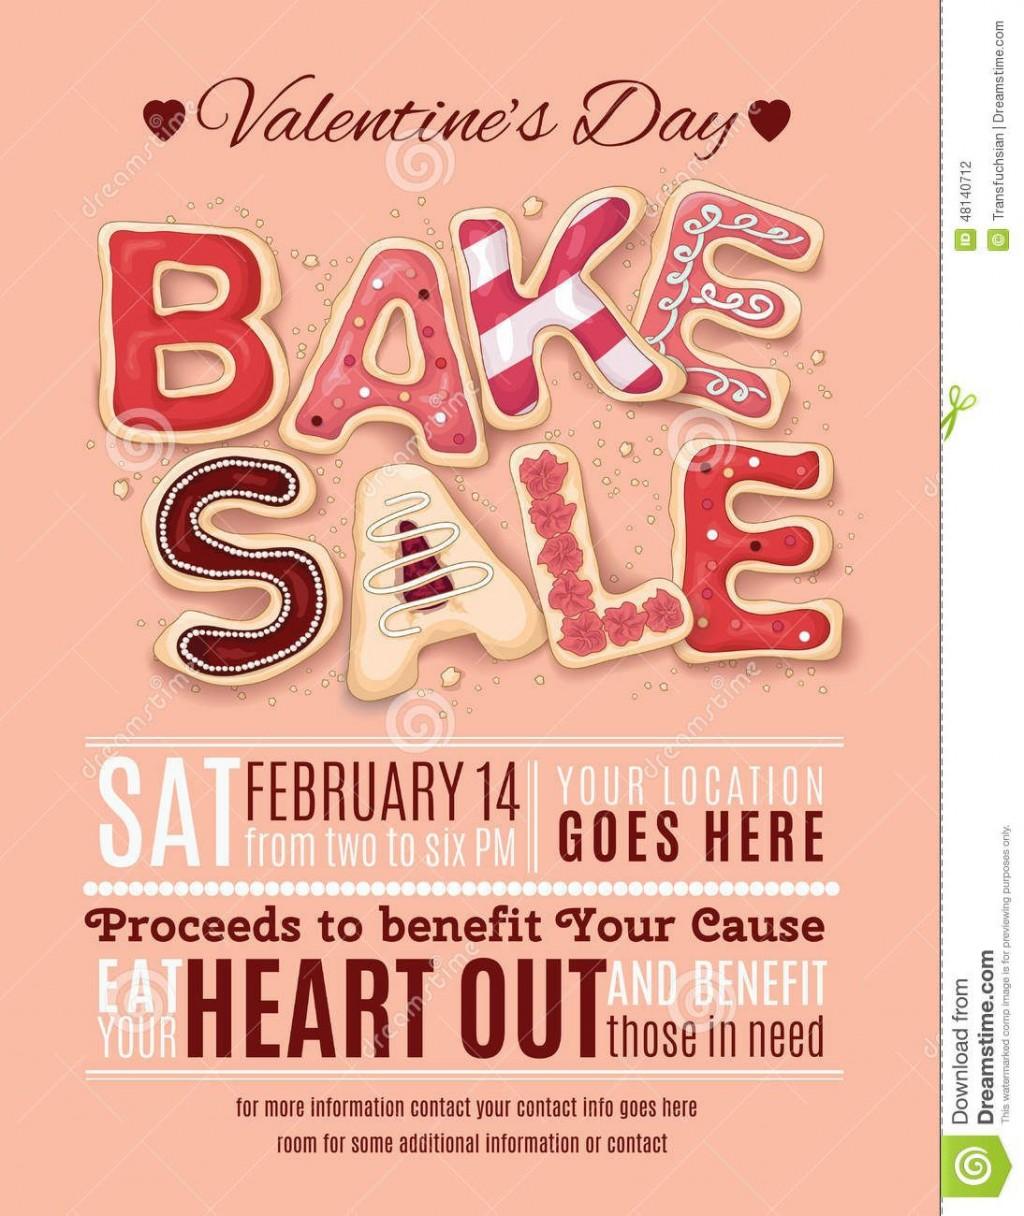 000 Wonderful Valentine Bake Sale Flyer Template Free Example  Valentine'Large